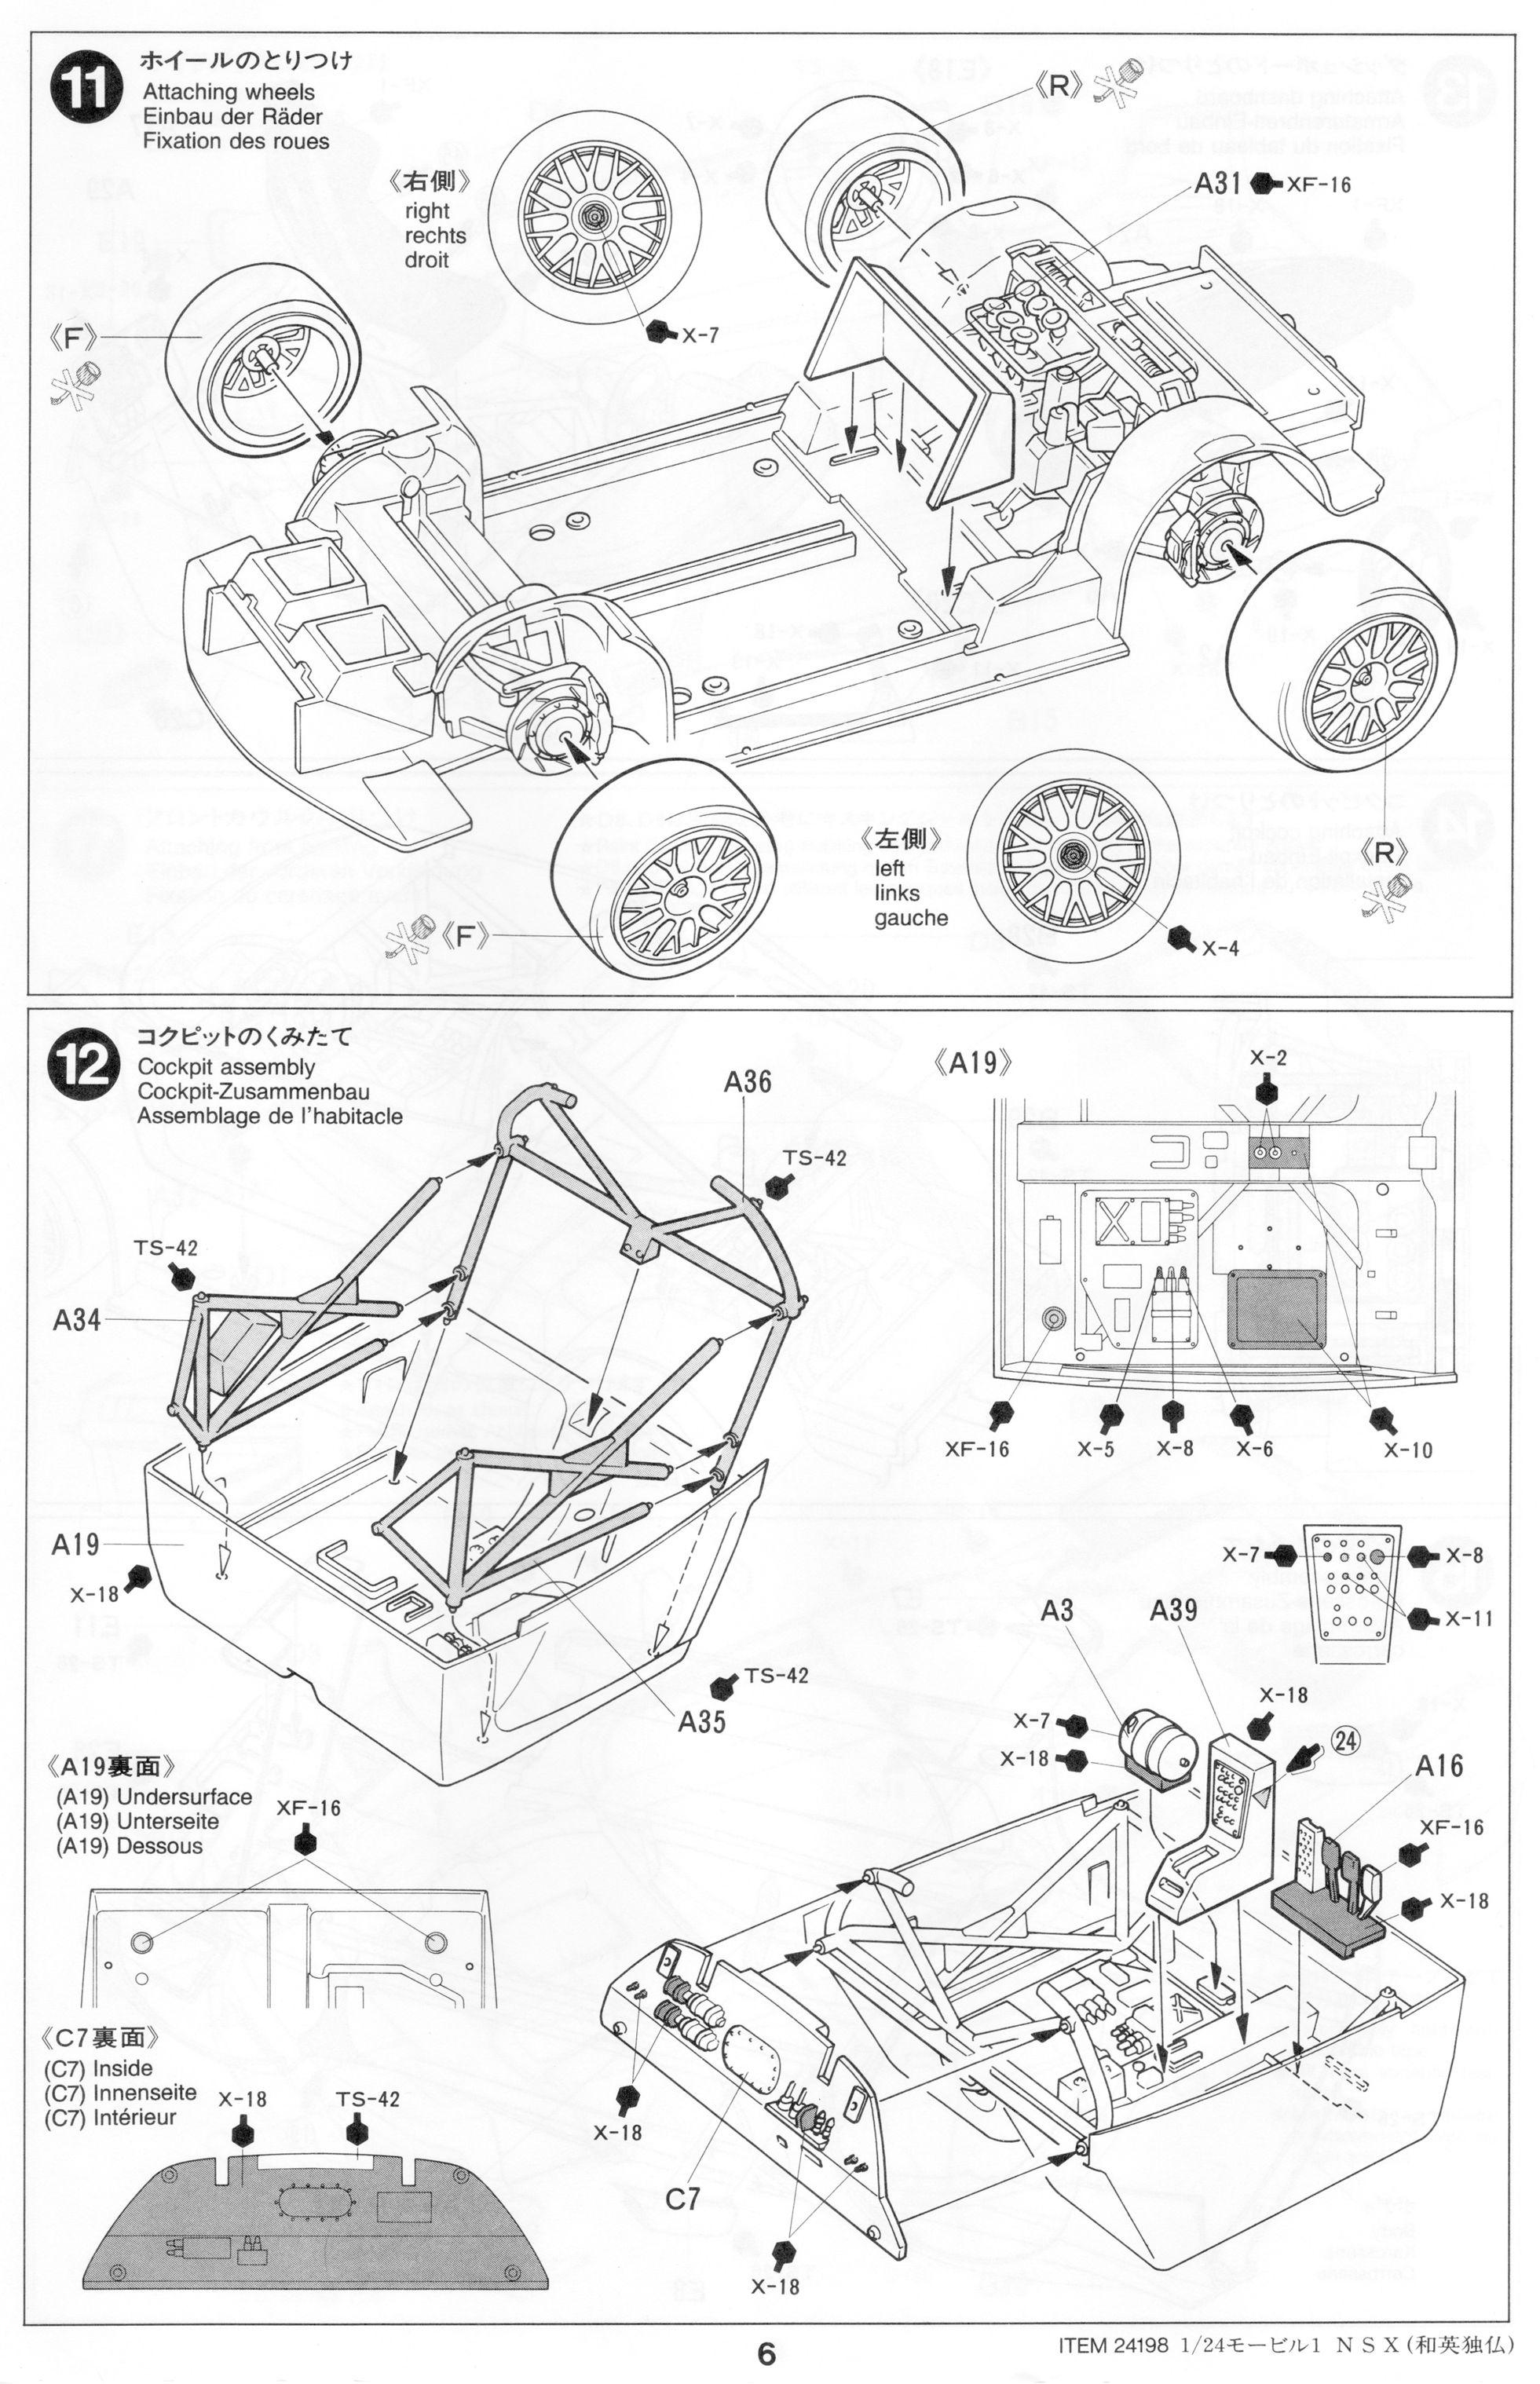 Pin By Gluefinger On Tamiya 1 24 Mobil1 Nsx Diy And Crafts Crafts Diagram